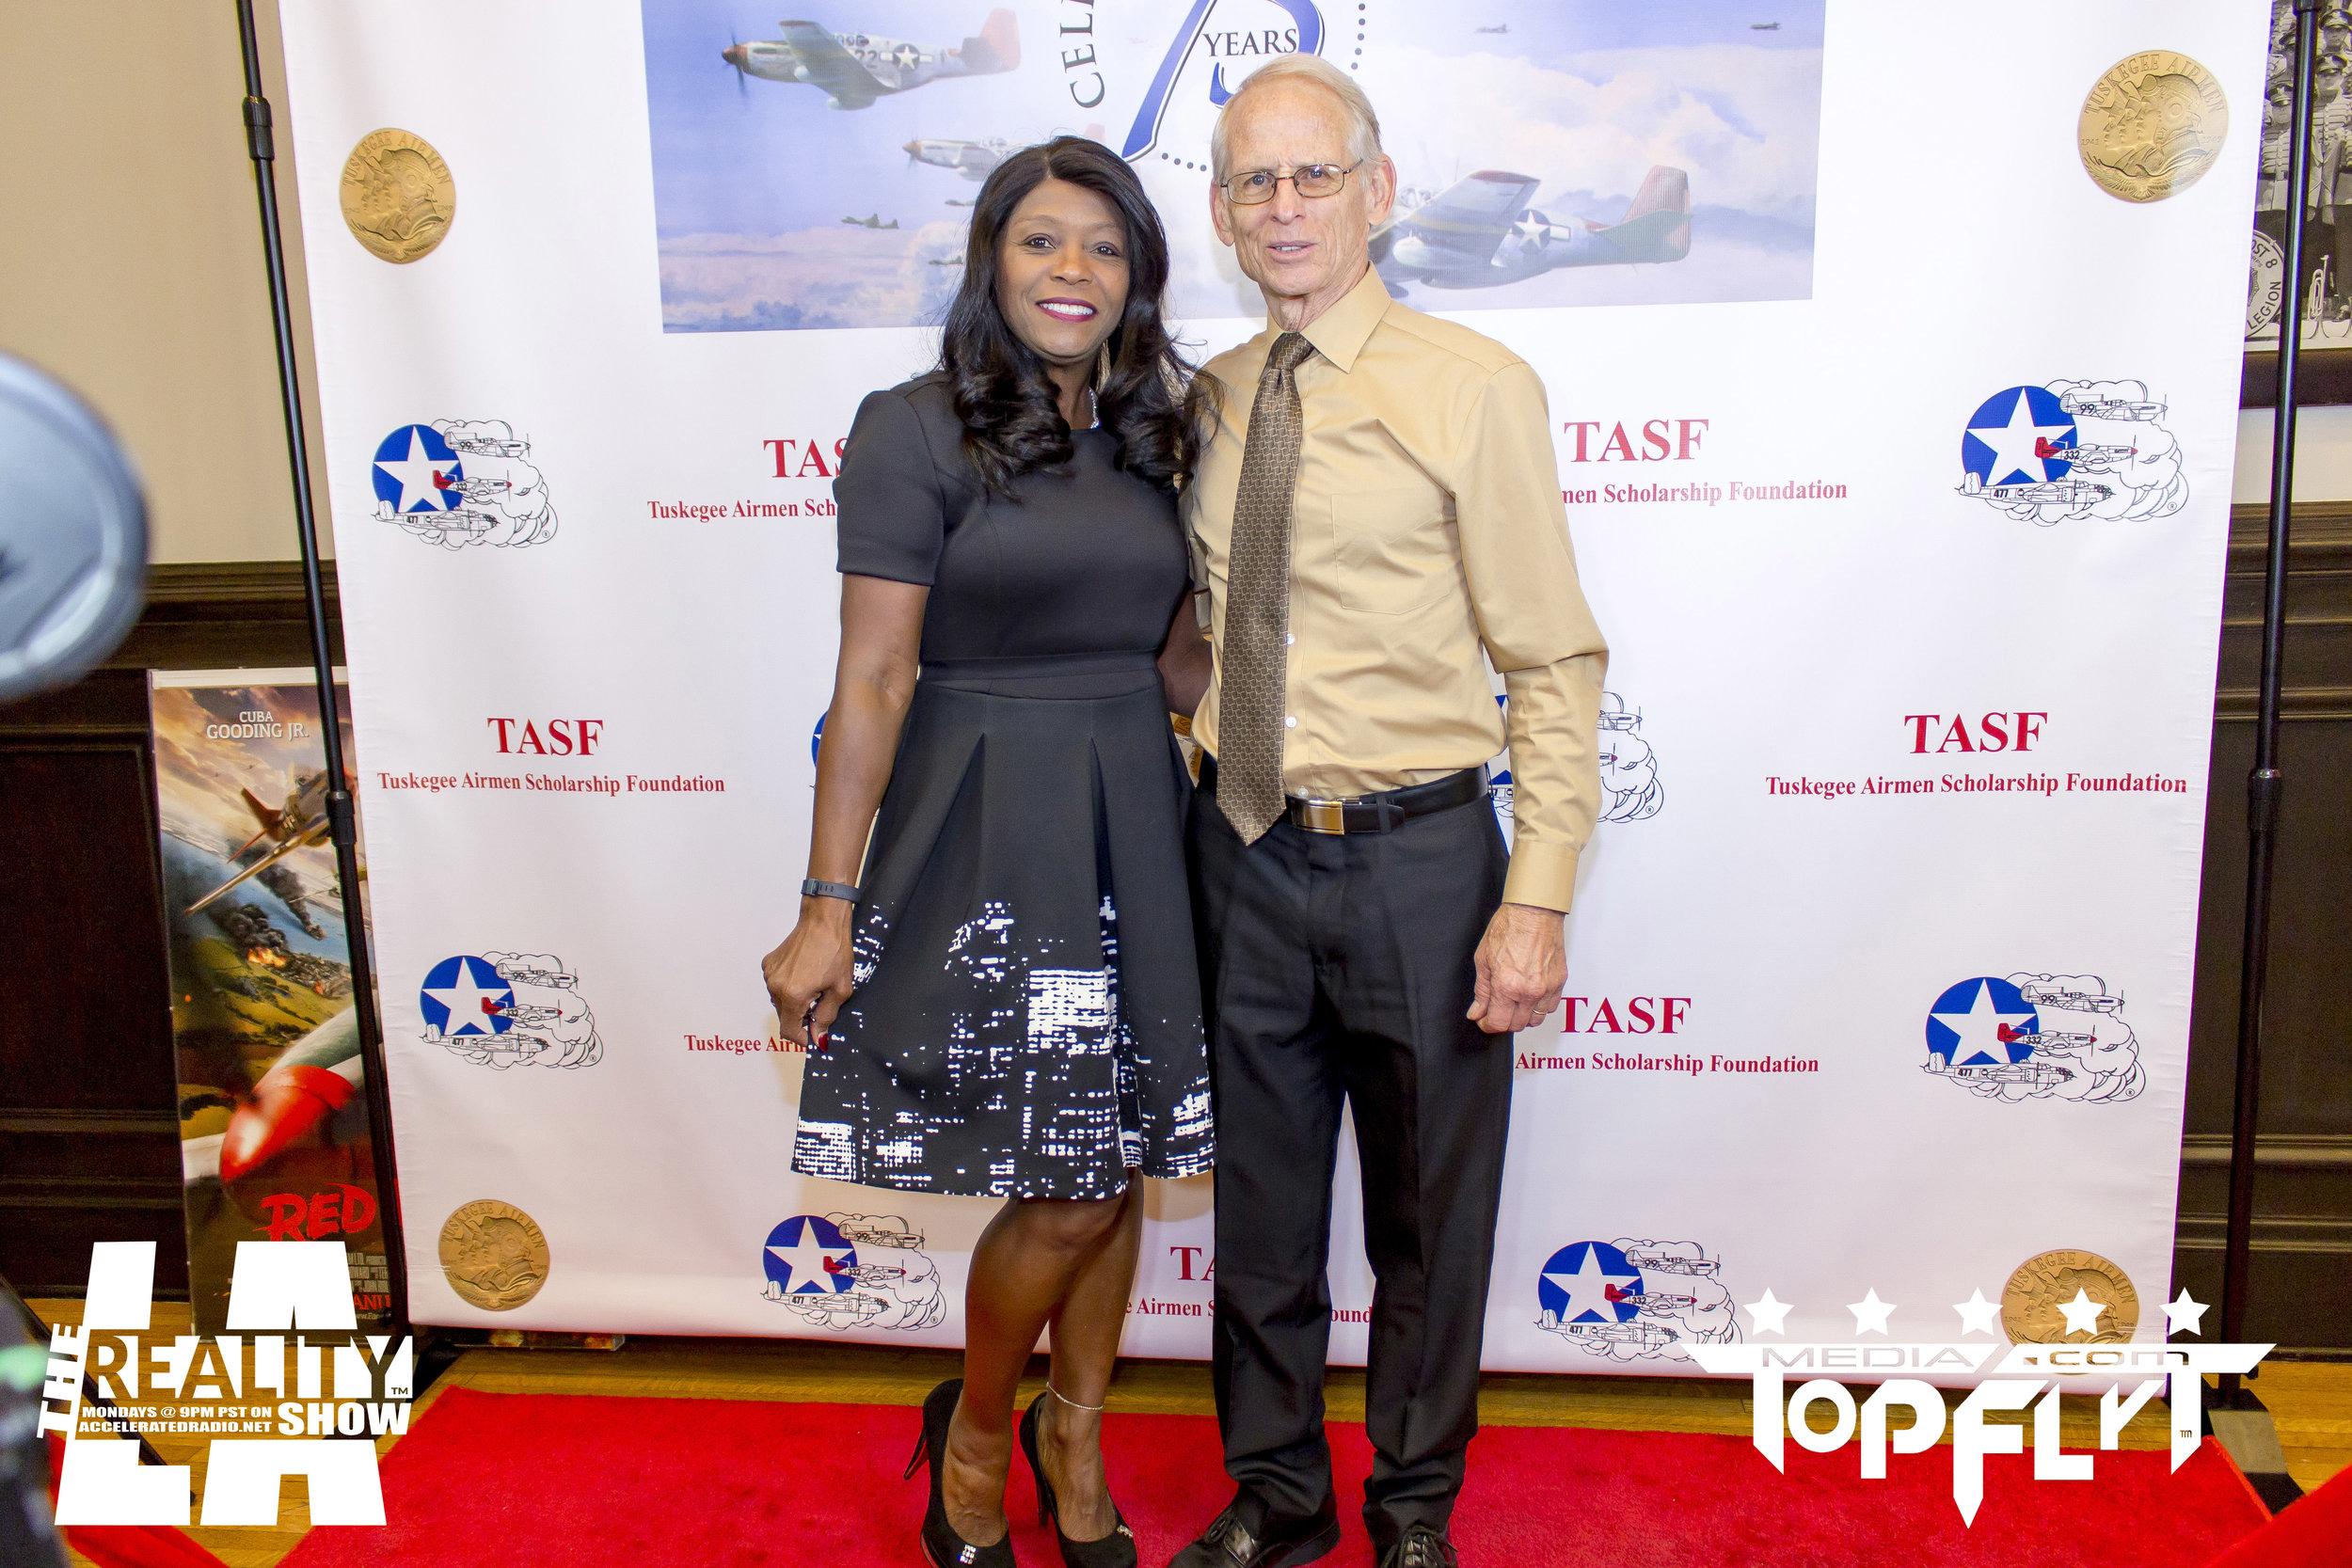 The Reality Show LA - Tuskegee Airmen 75th Anniversary VIP Reception_57.jpg